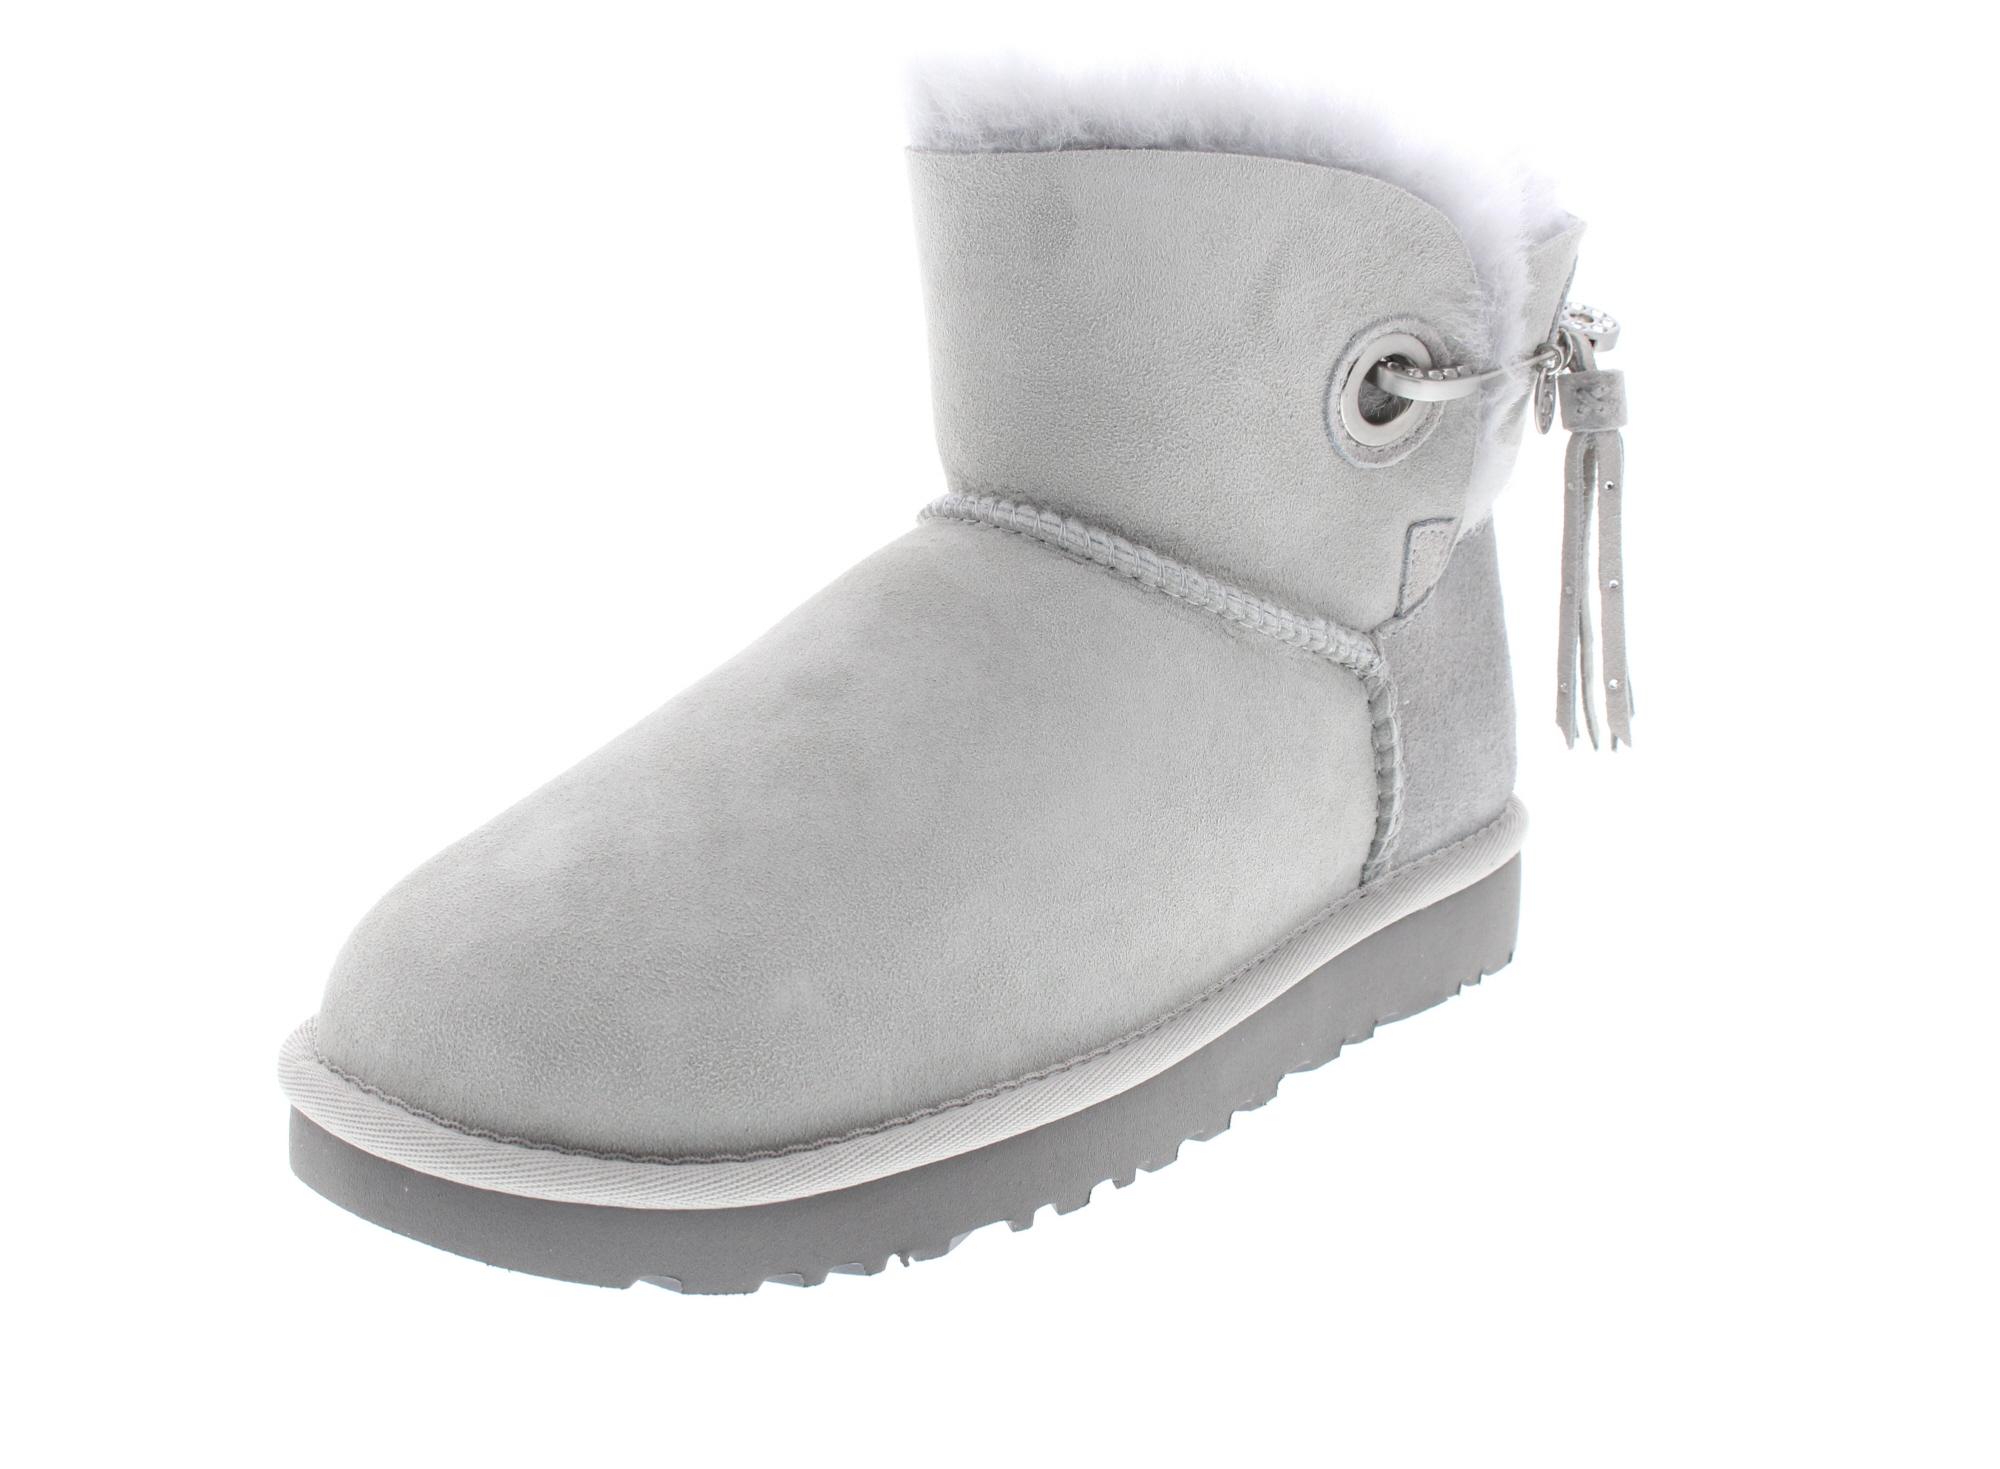 UGG Damenschuhe - Stiefelette JOSEY 1019627 grey violet_0